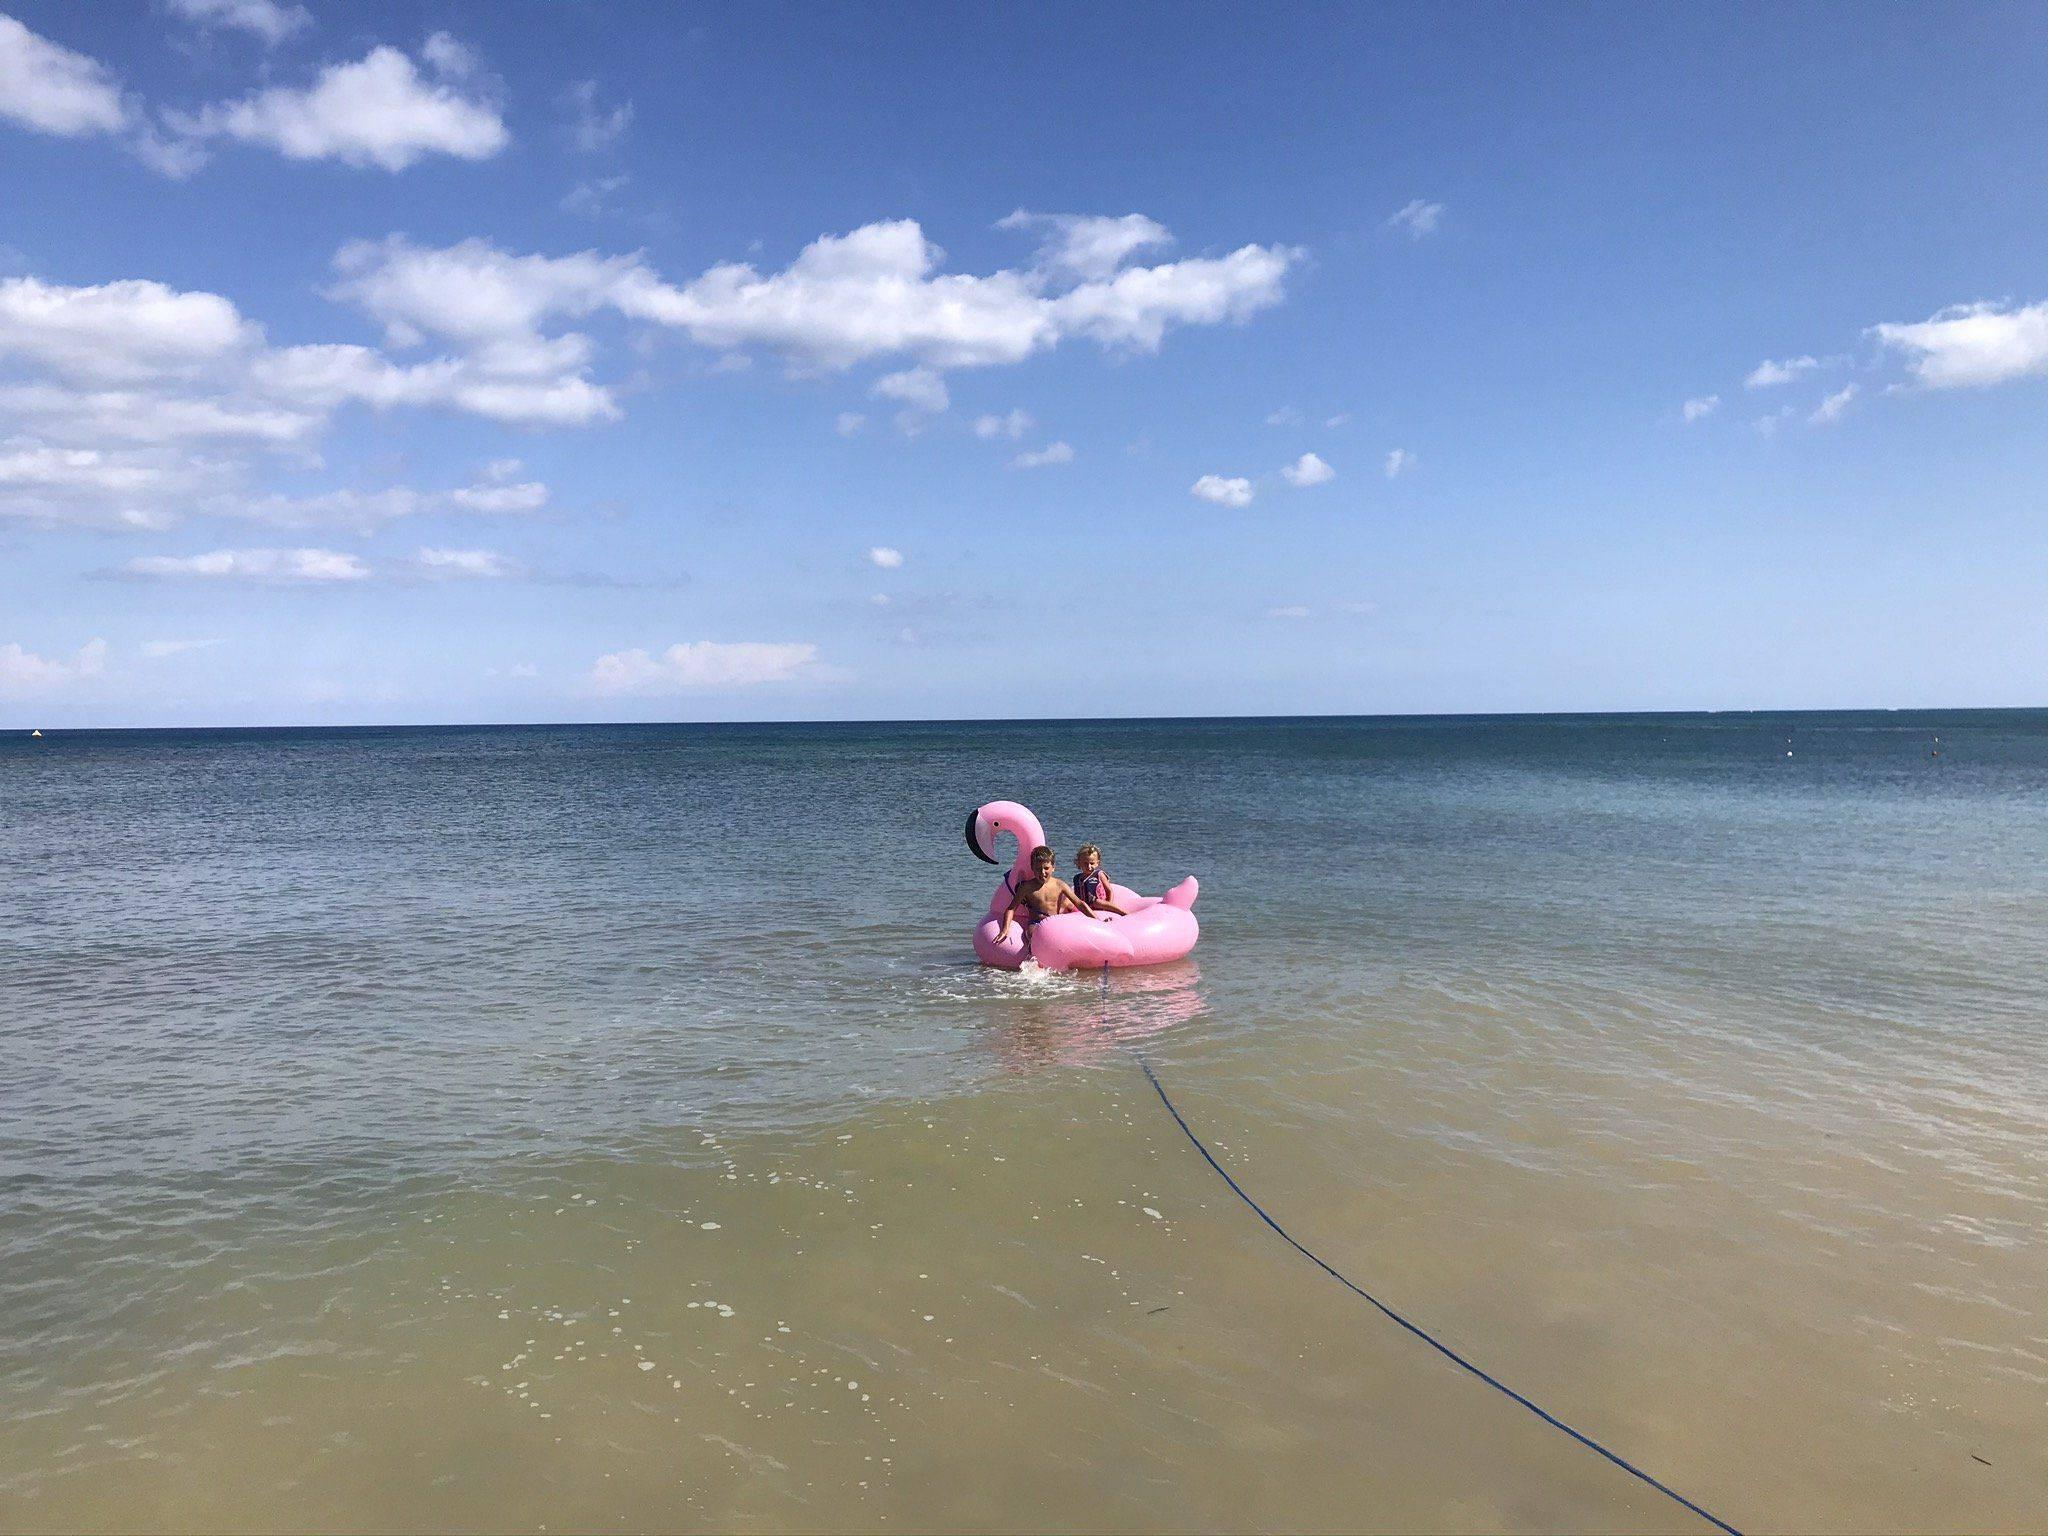 Kinderhotel Kreta Strandspielzeug